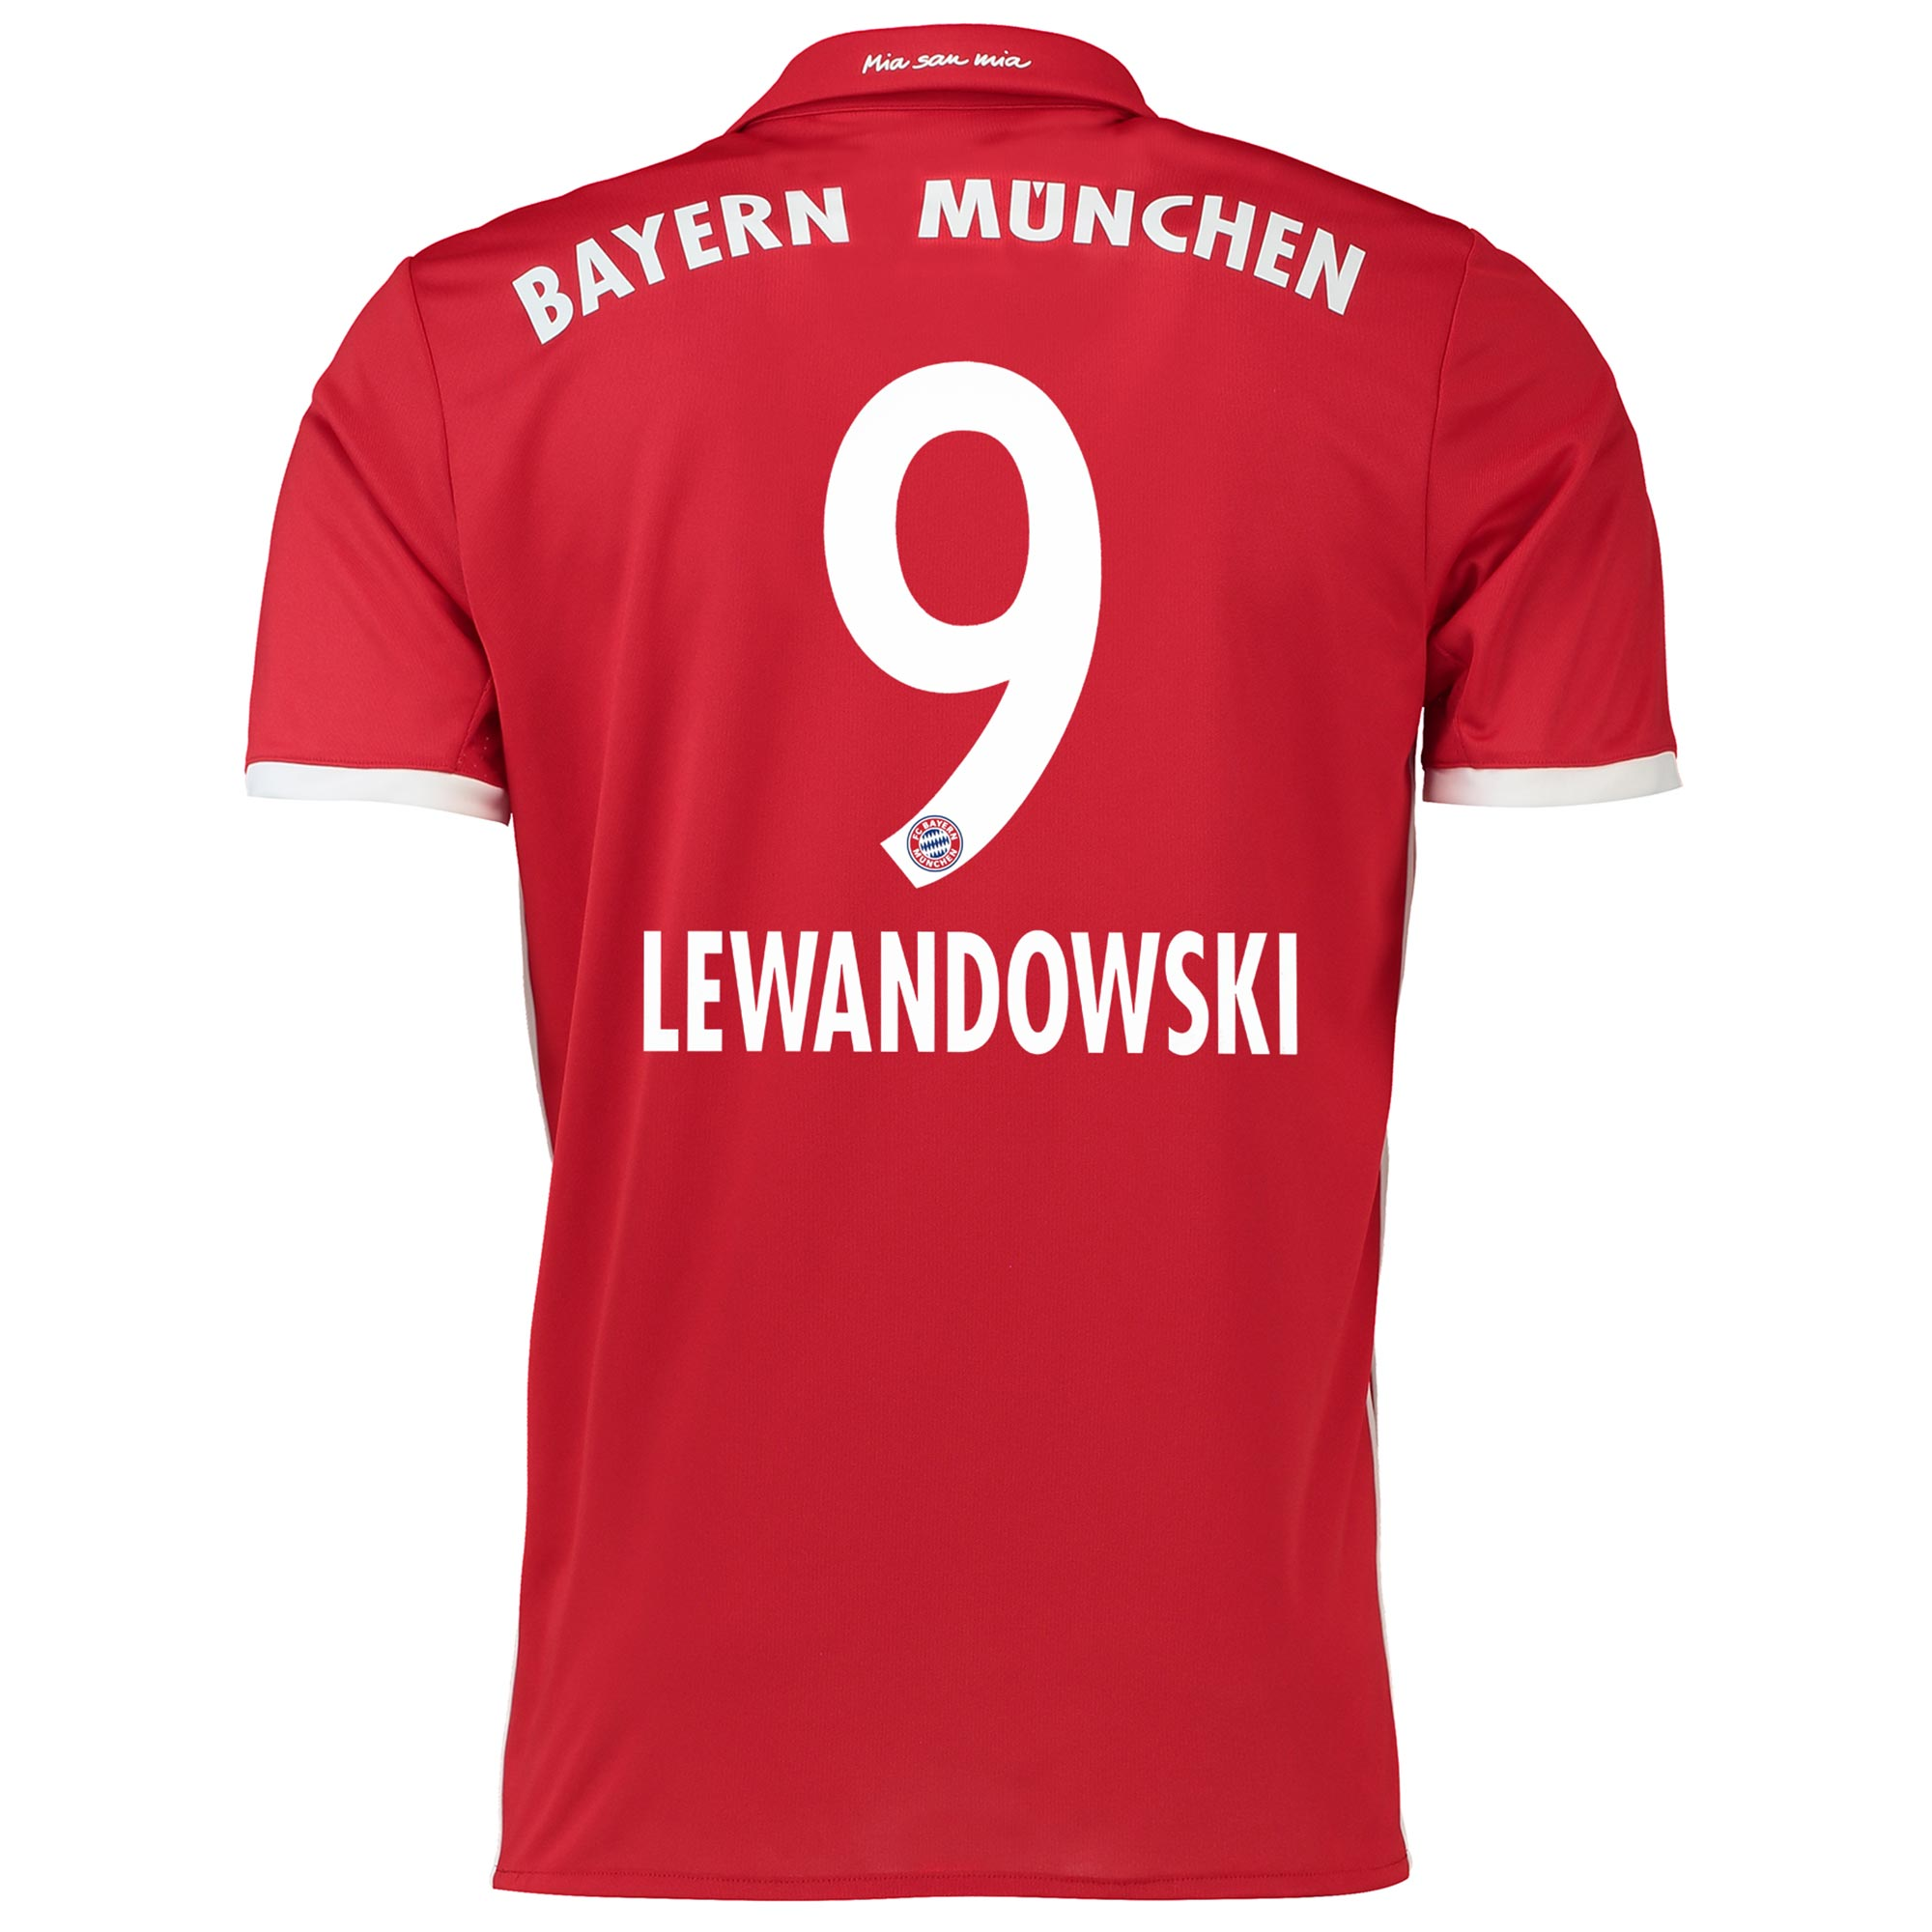 Image of Bayern Munich Home Shirt 2016-17 with Lewandowski 9 printing, Red